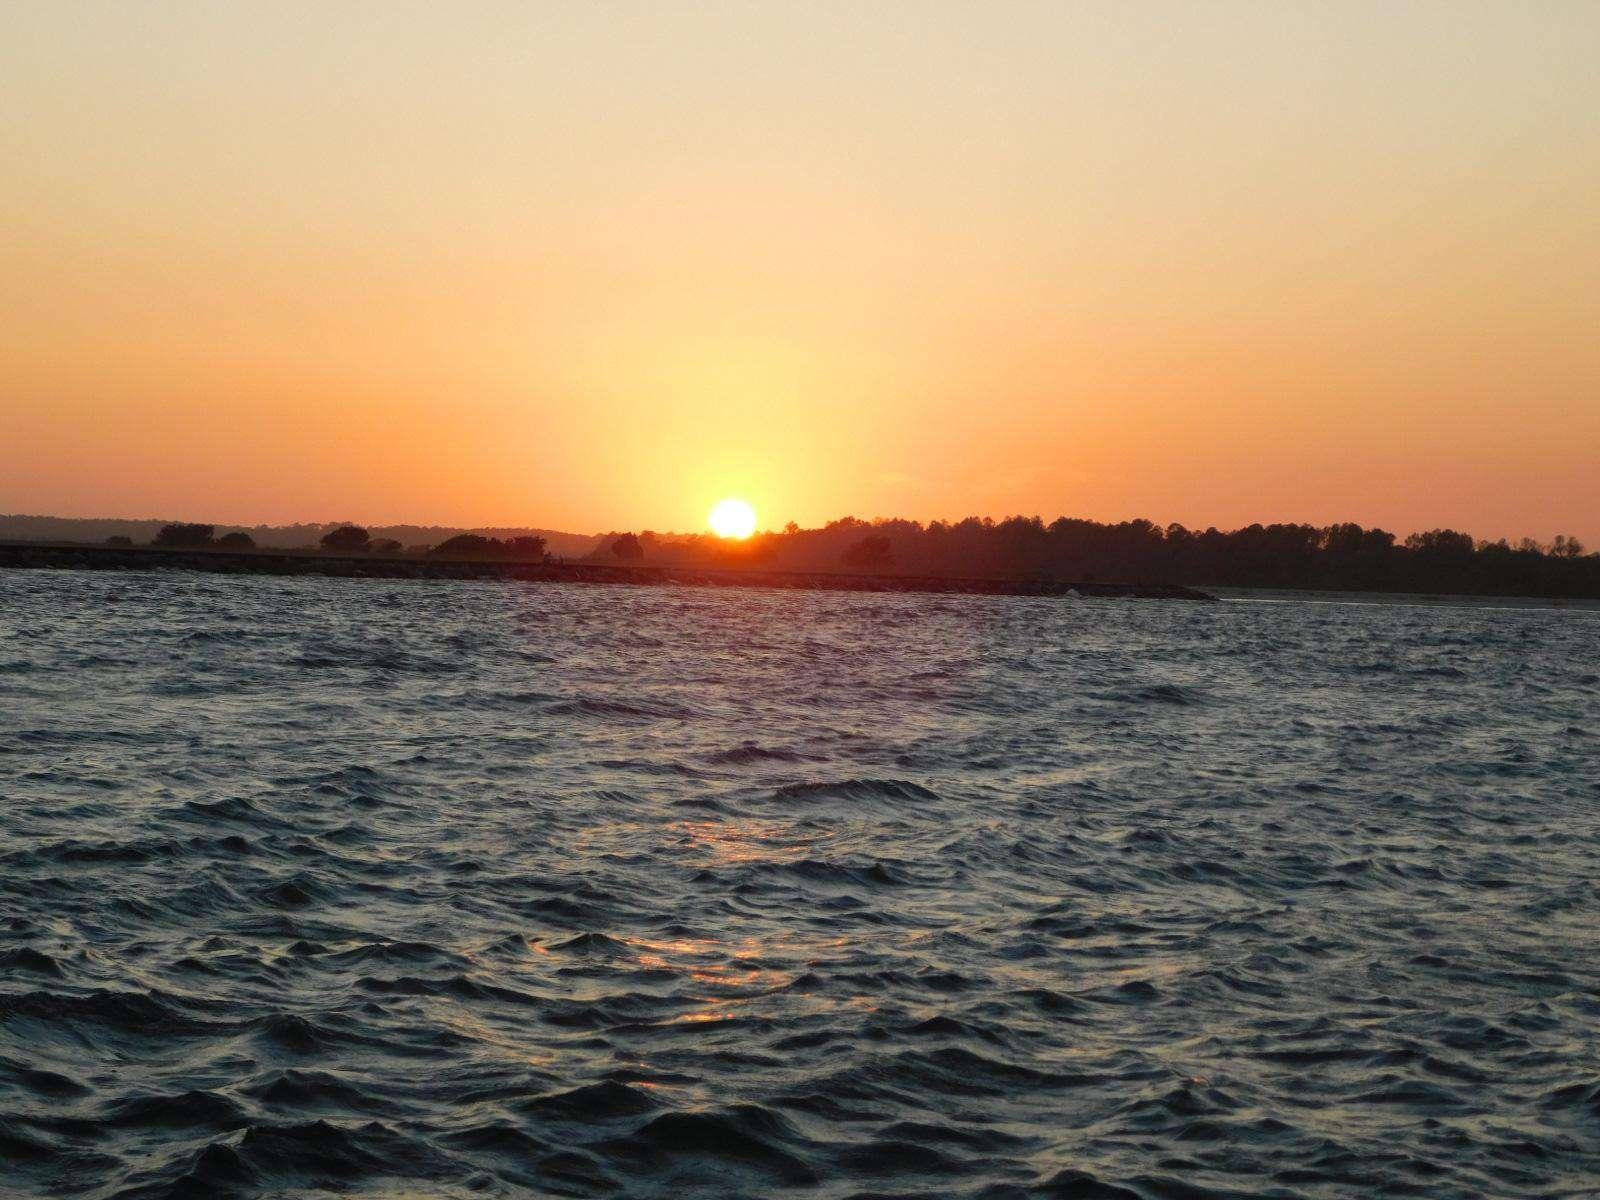 Beautiful sunset from a sunset cruise